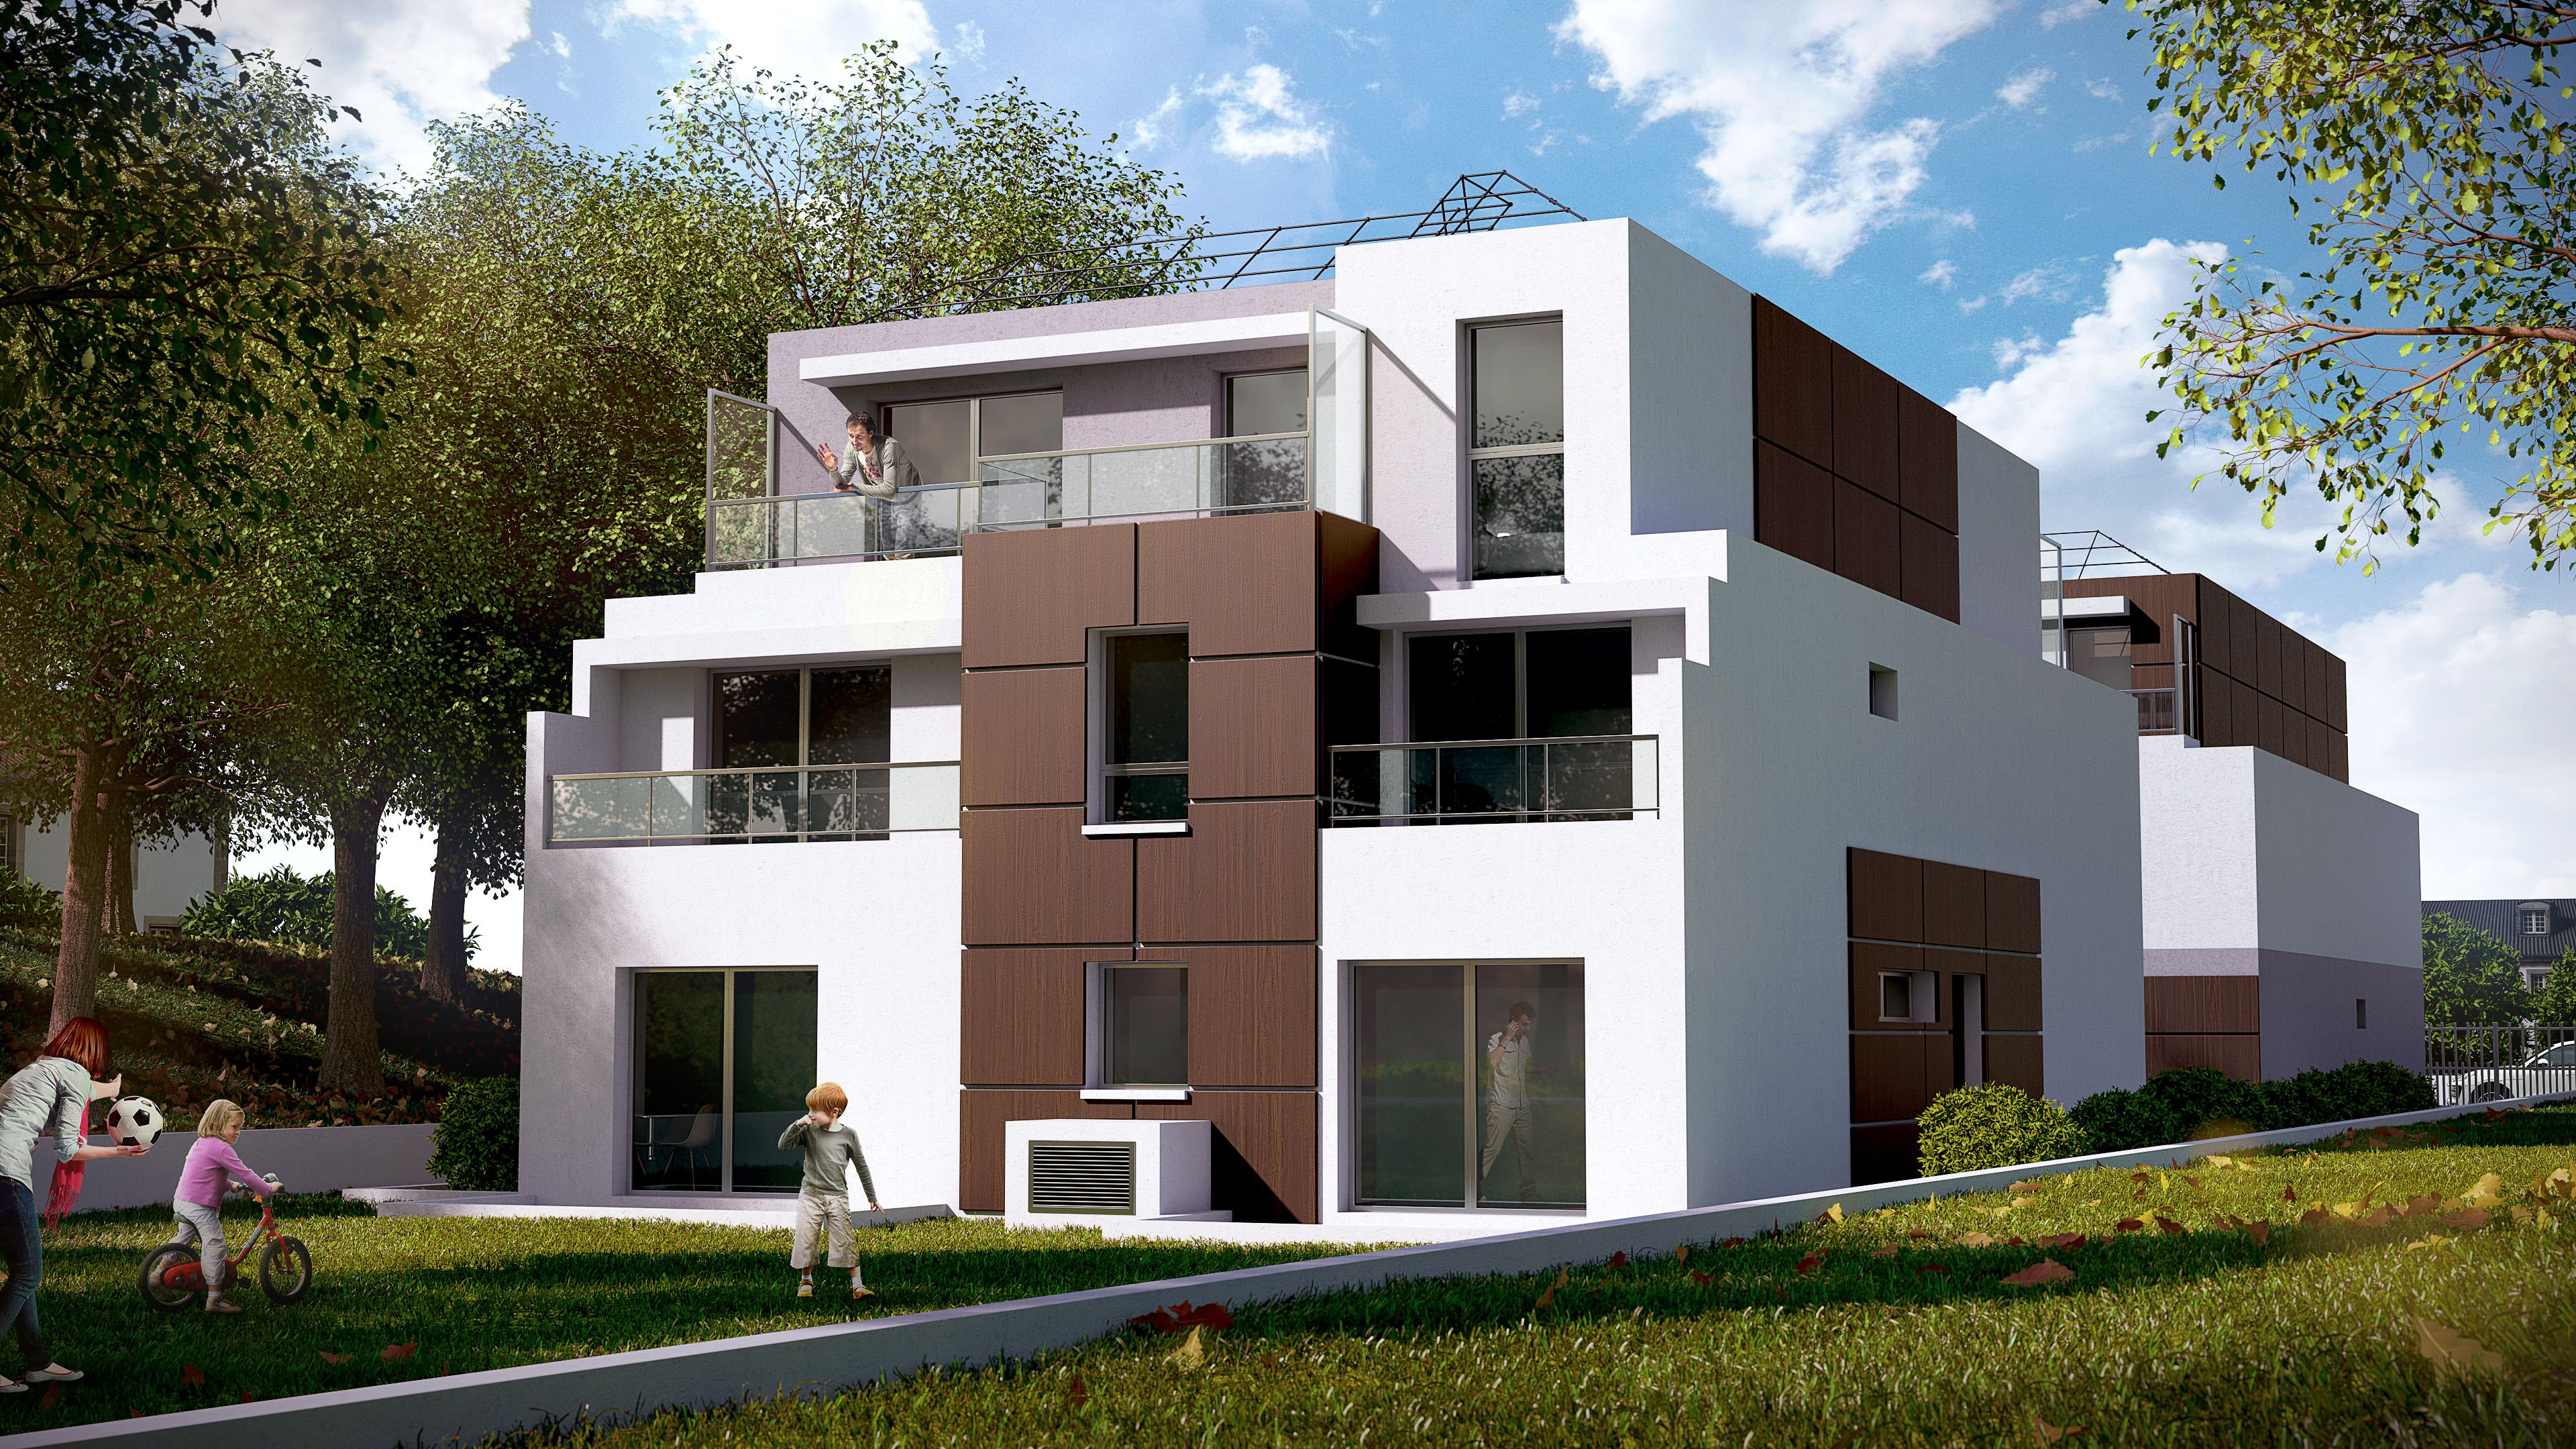 Simulation 3d maison interesting d visual simulation for Simulation construction maison prix